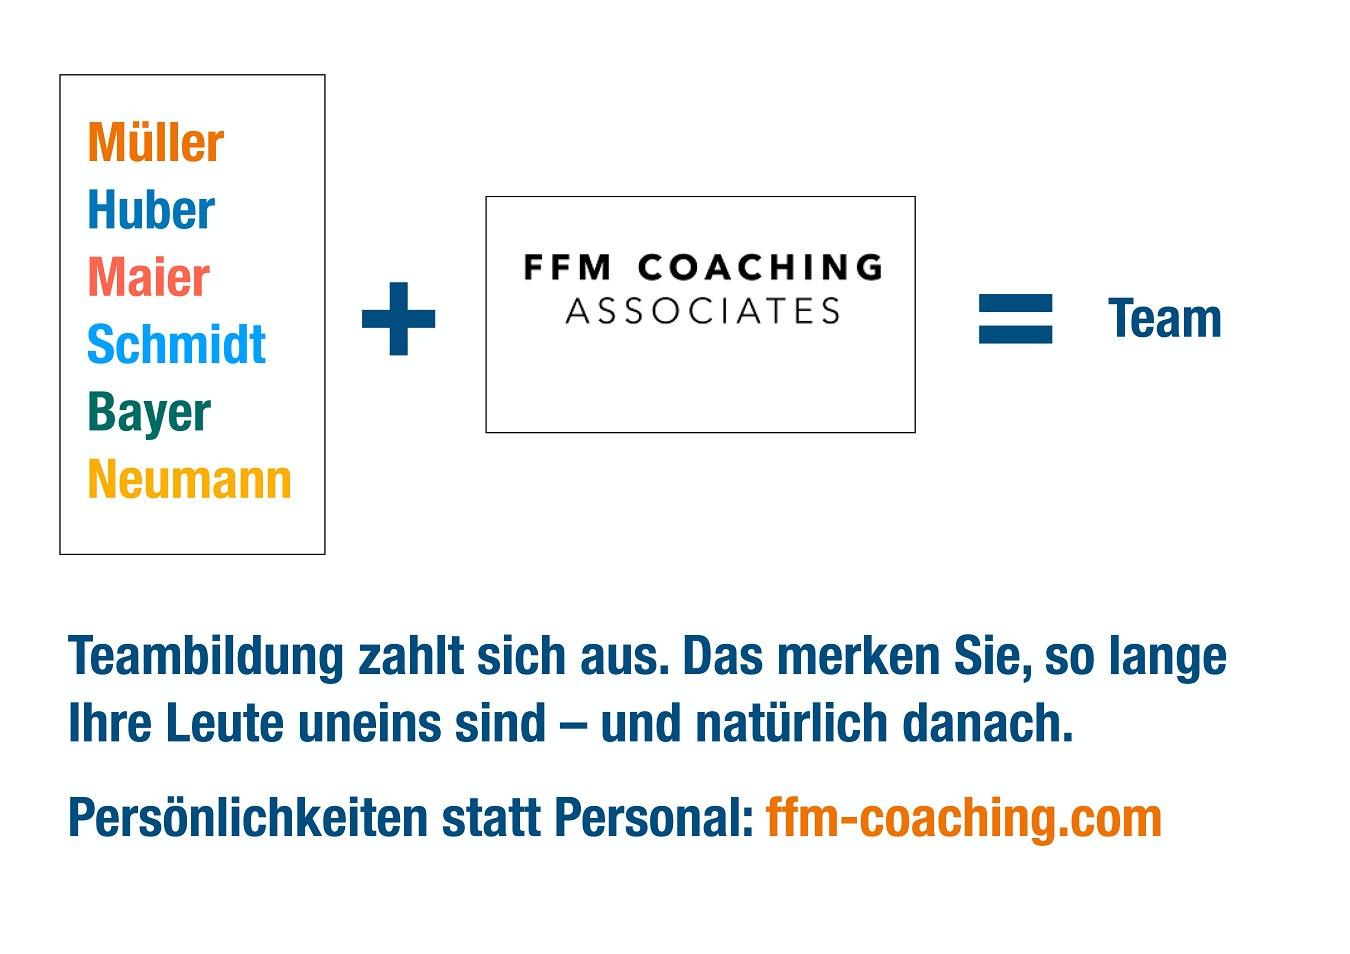 Teambildung in Frankfurt mit FFM Coaching Associates